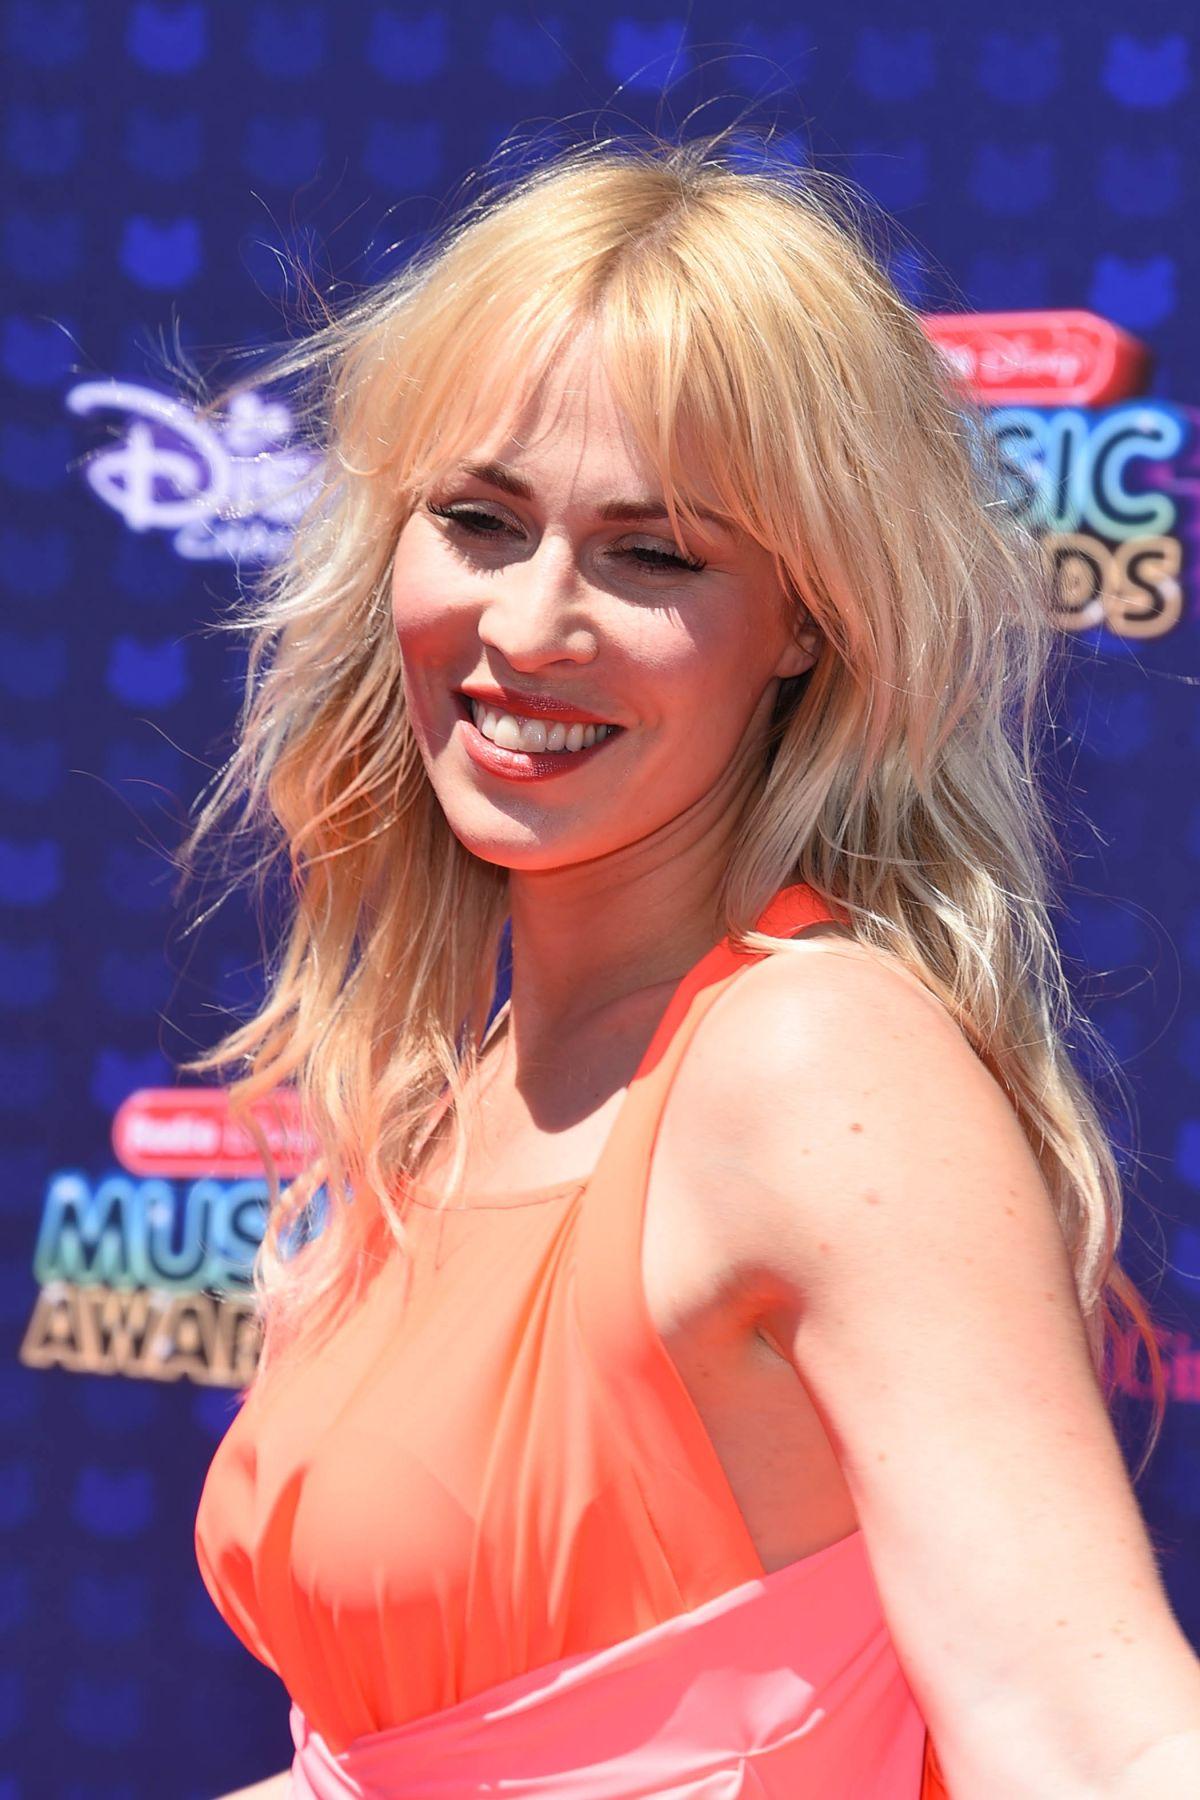 NATASHA BEDINGFIELD at 2017 Radio Disney Music Awards in Los Angeles 04/29/2017